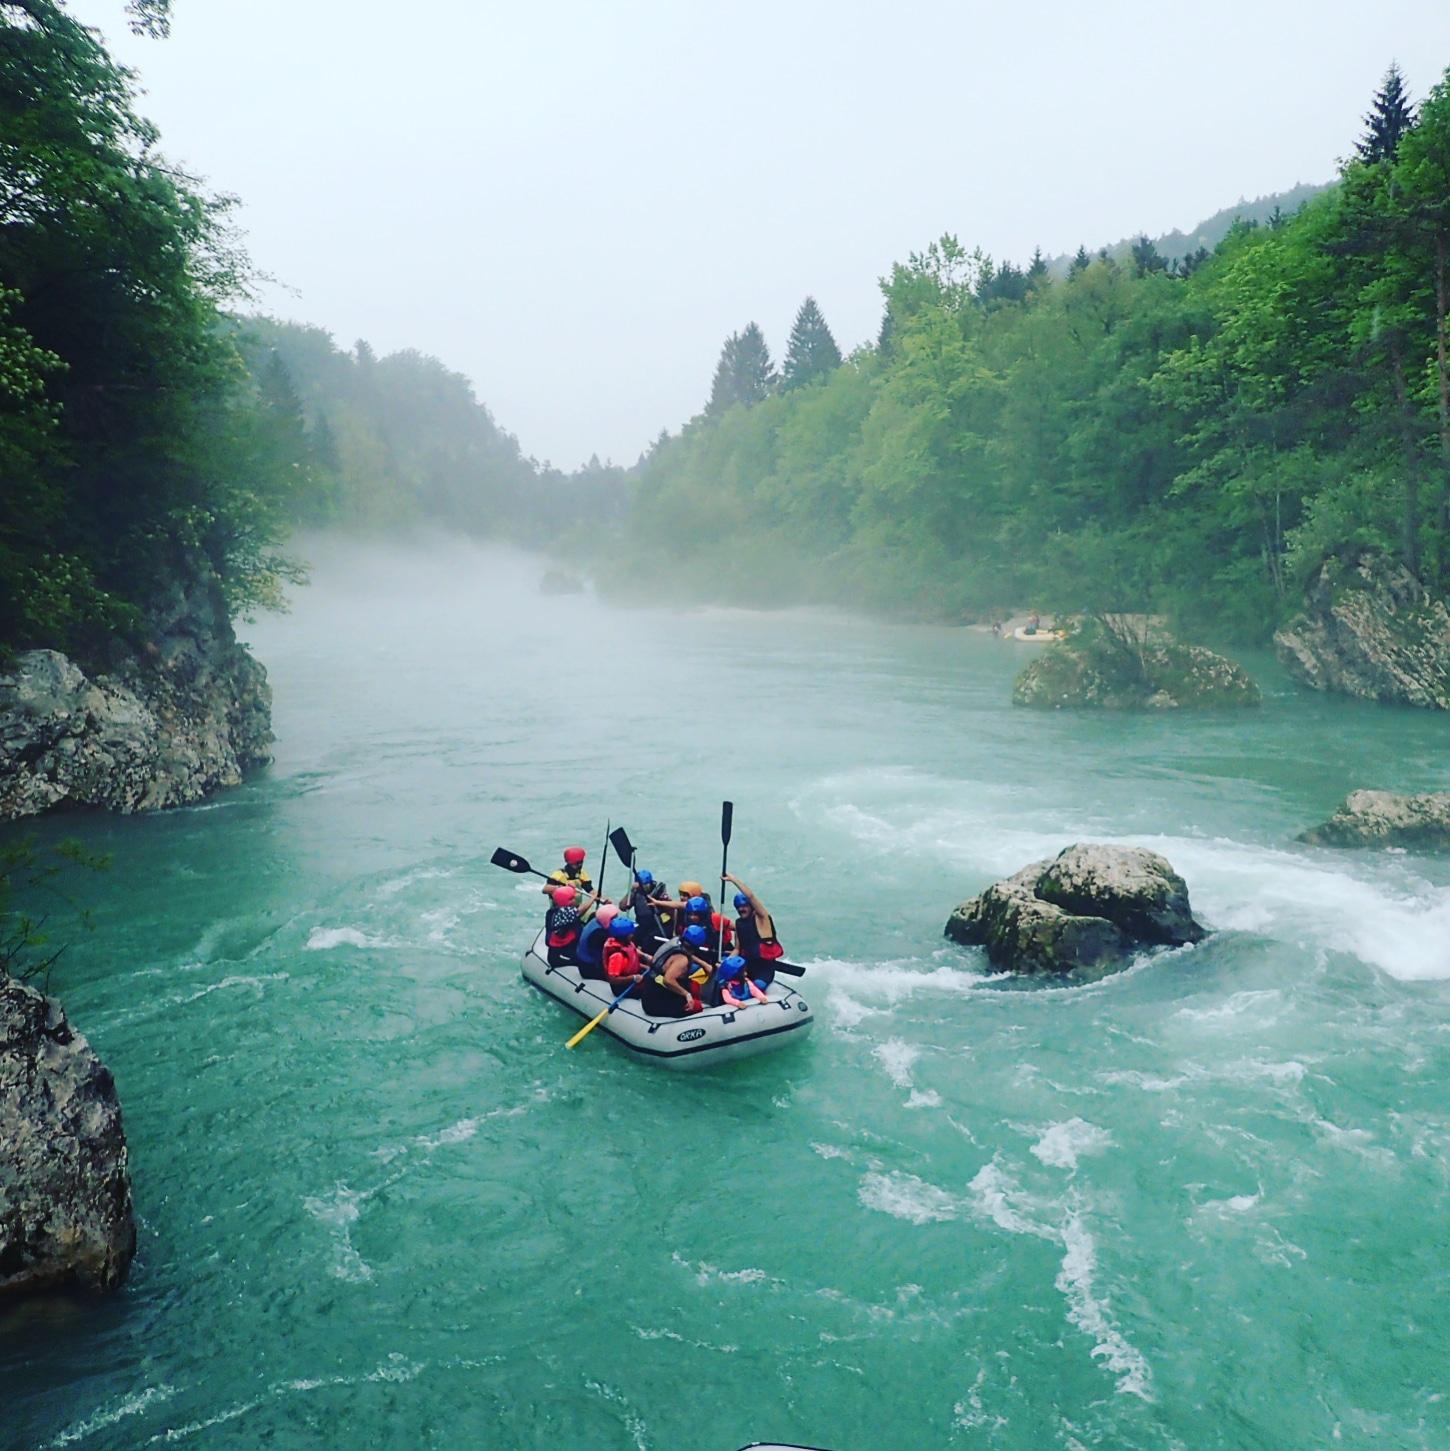 Bled Rafting on foggy river Sava